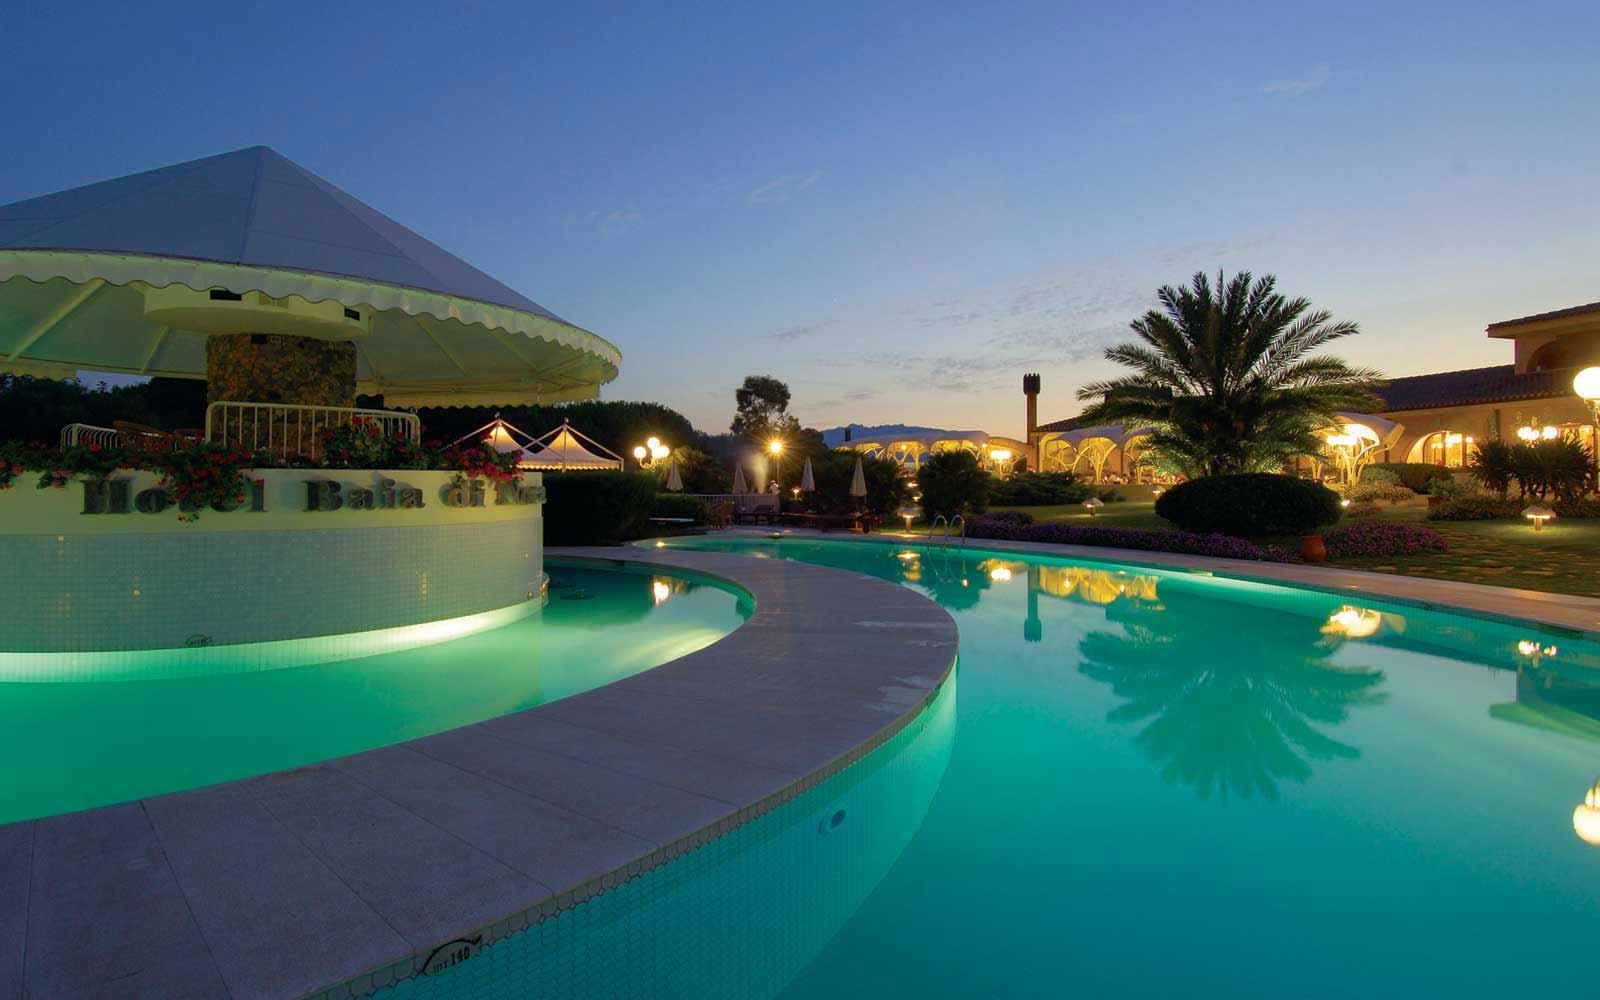 Hotel Baia Di Nora at night